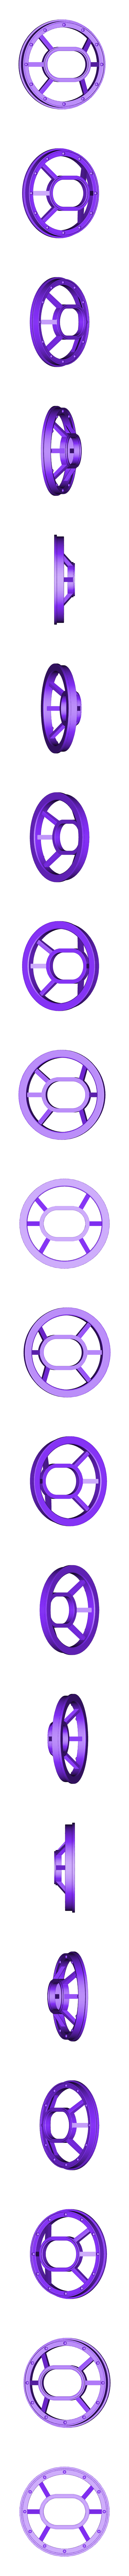 eye_window_DUAL_frame.stl Download free STL file Gowanus Monster - Margo Series • 3D printable object, boldmachines